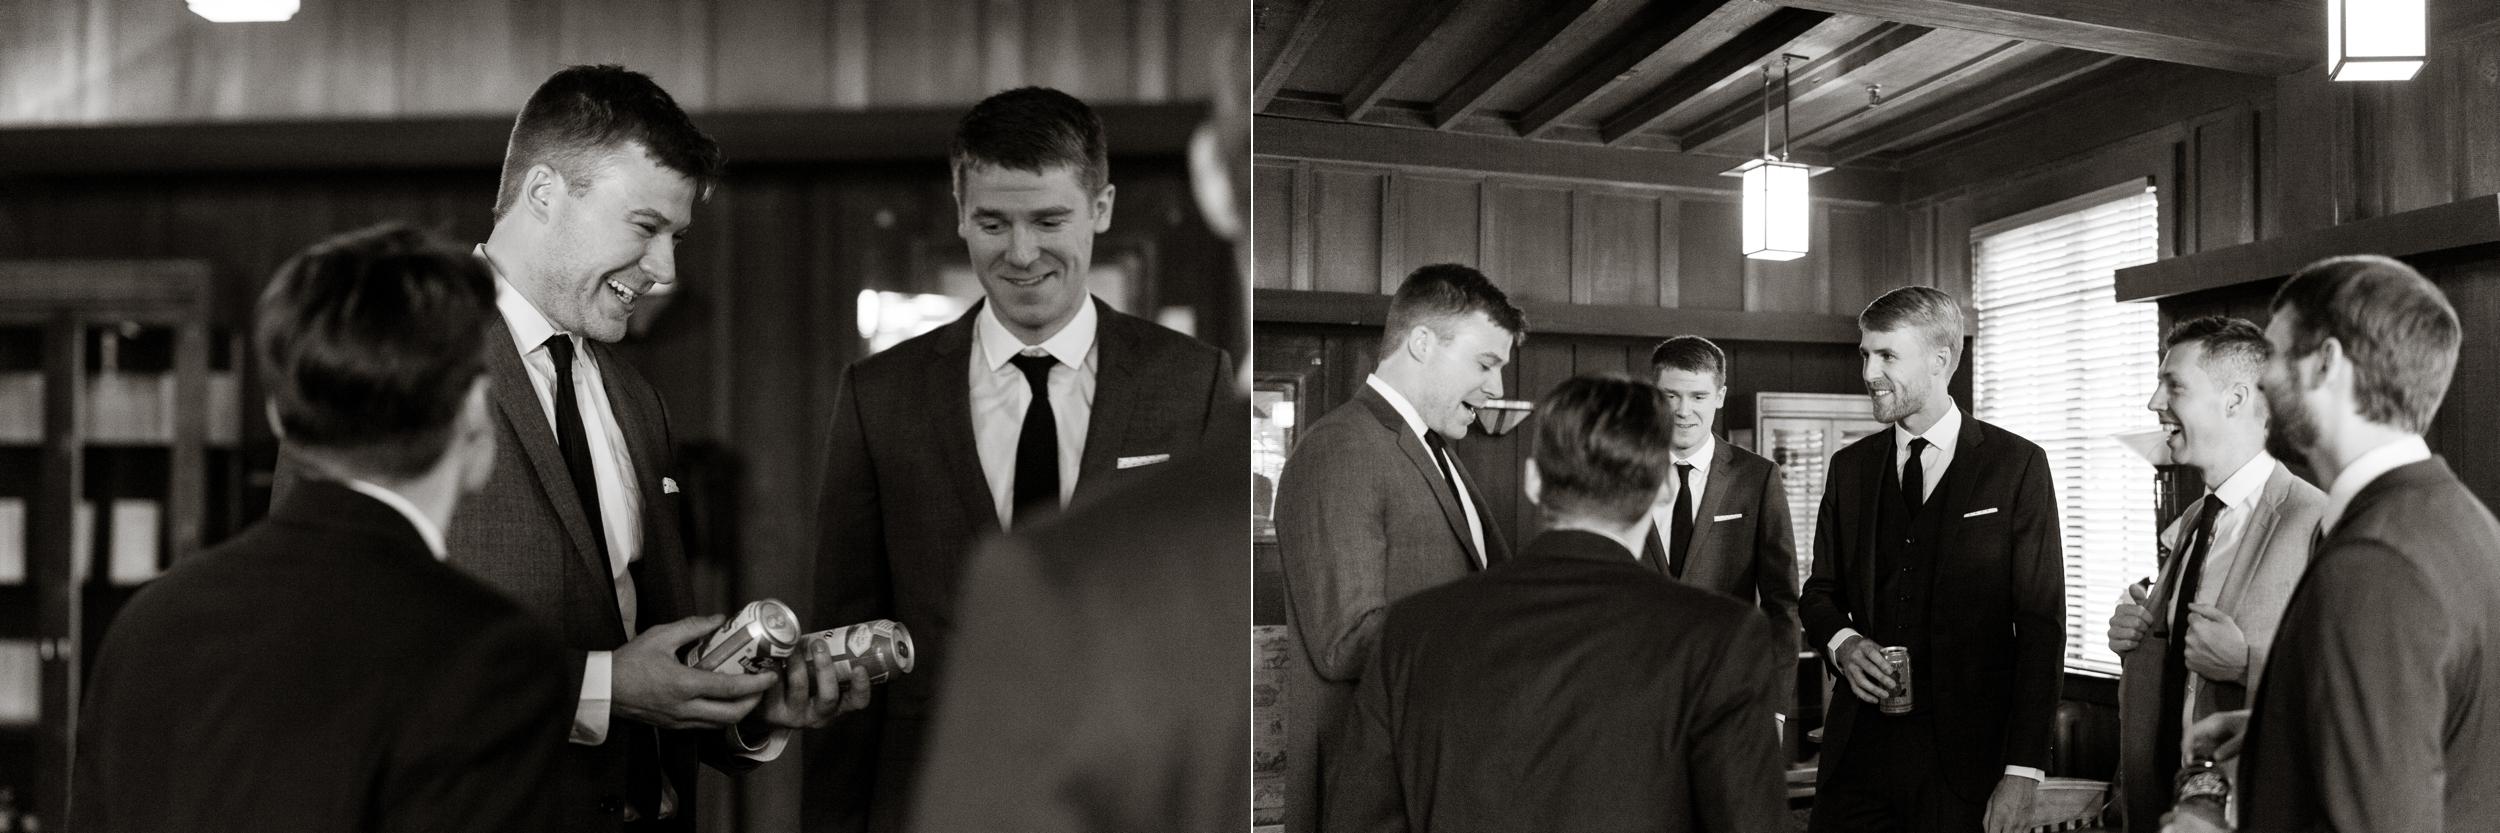 faculty-club-berkeley-wedding-photographer-vc013.jpg